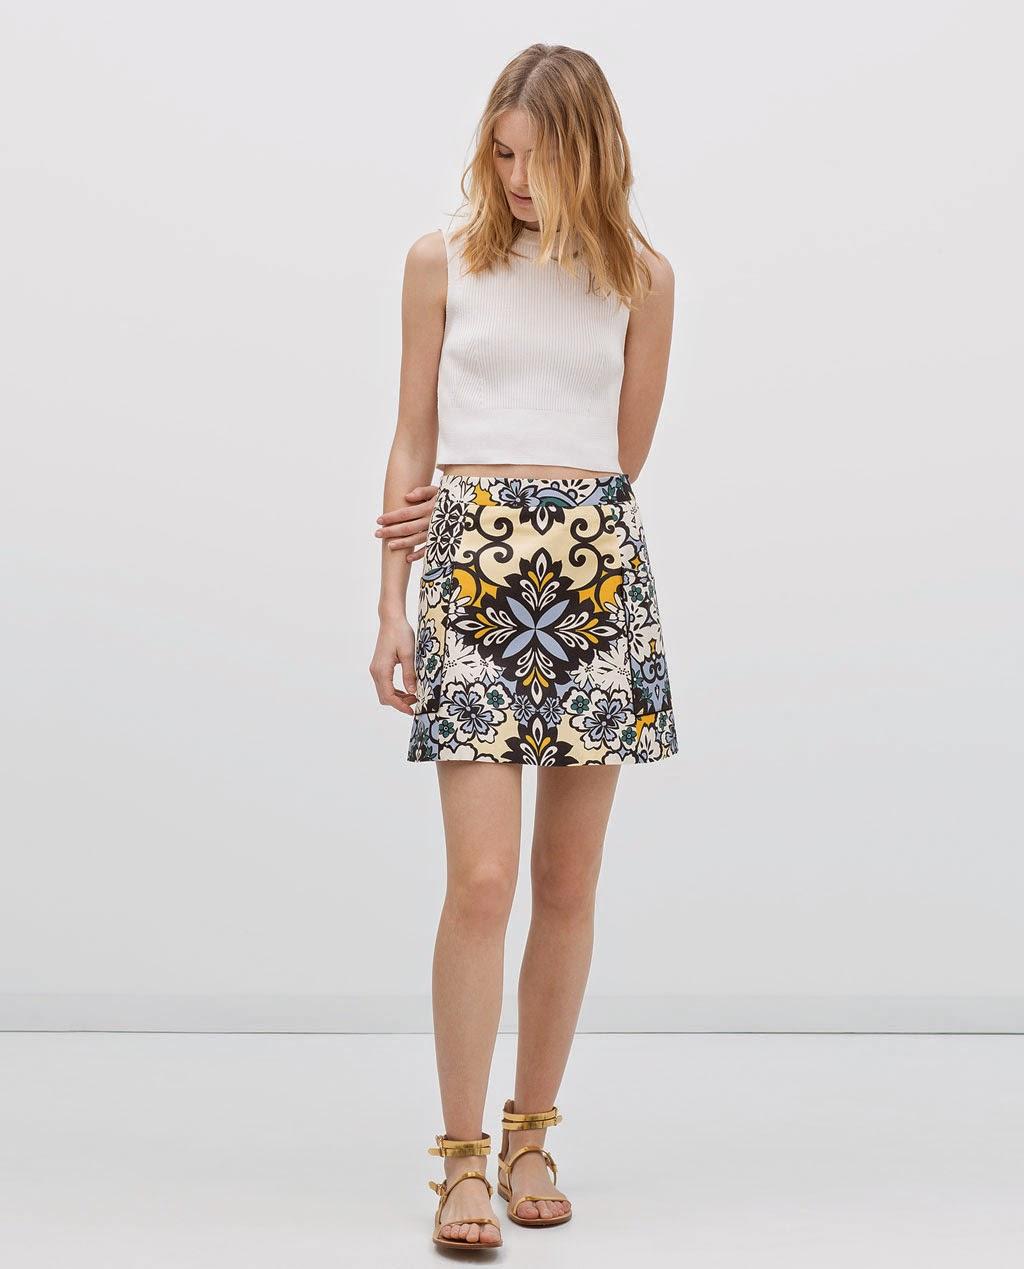 Zara - Minissaia estampada, top branco e sandálias planas laminadas